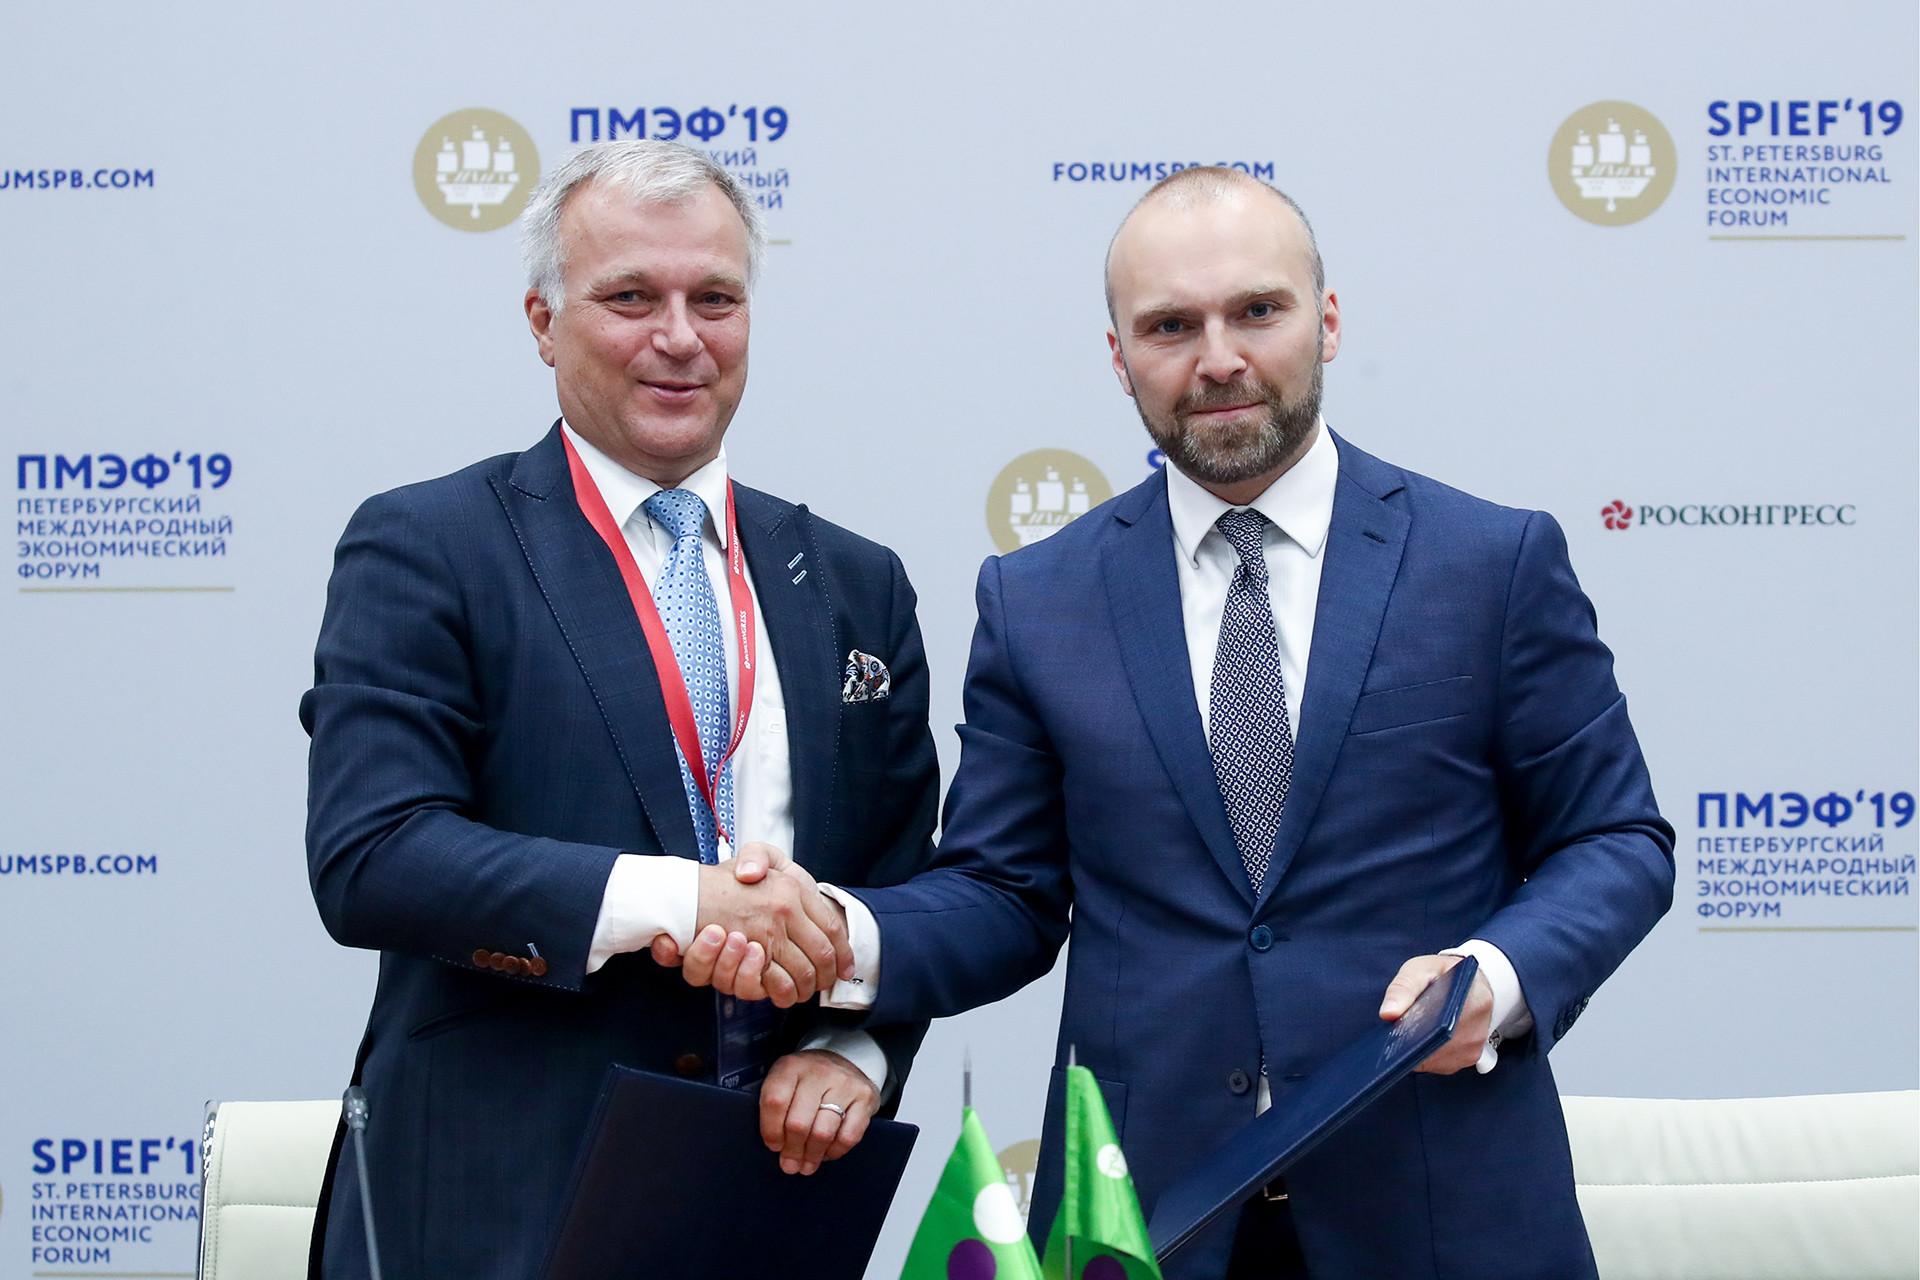 Ари-Джуси Кнаапила, президент и главен изпълнителен директор на Cinia Oy (вляво) и Геворк Вермишян, главен изпълнителен директор на